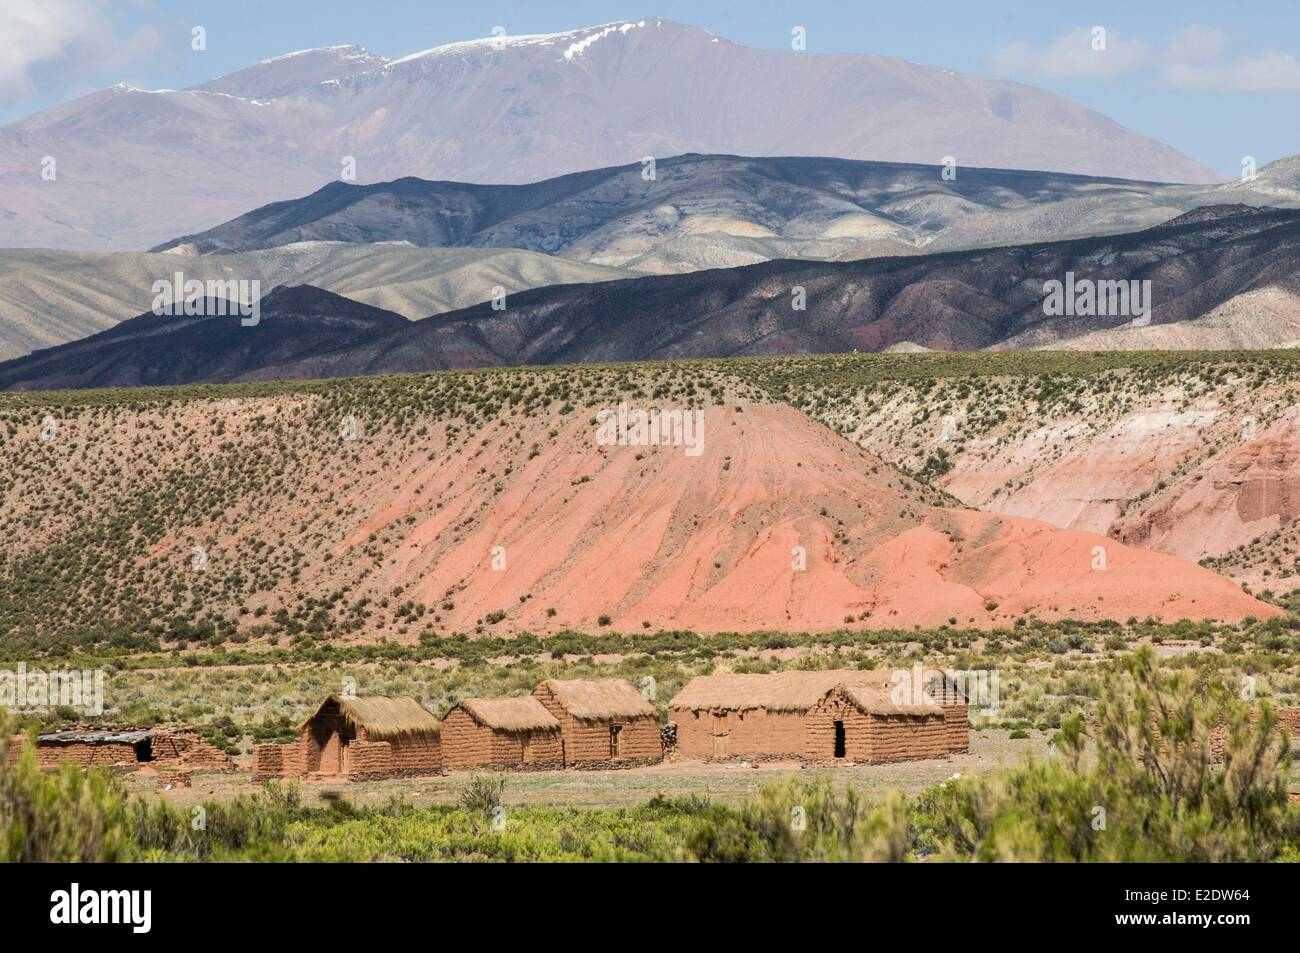 Argentina Noroeste Jujuy province Cusi Cusi indian village in adobe - Stock Image